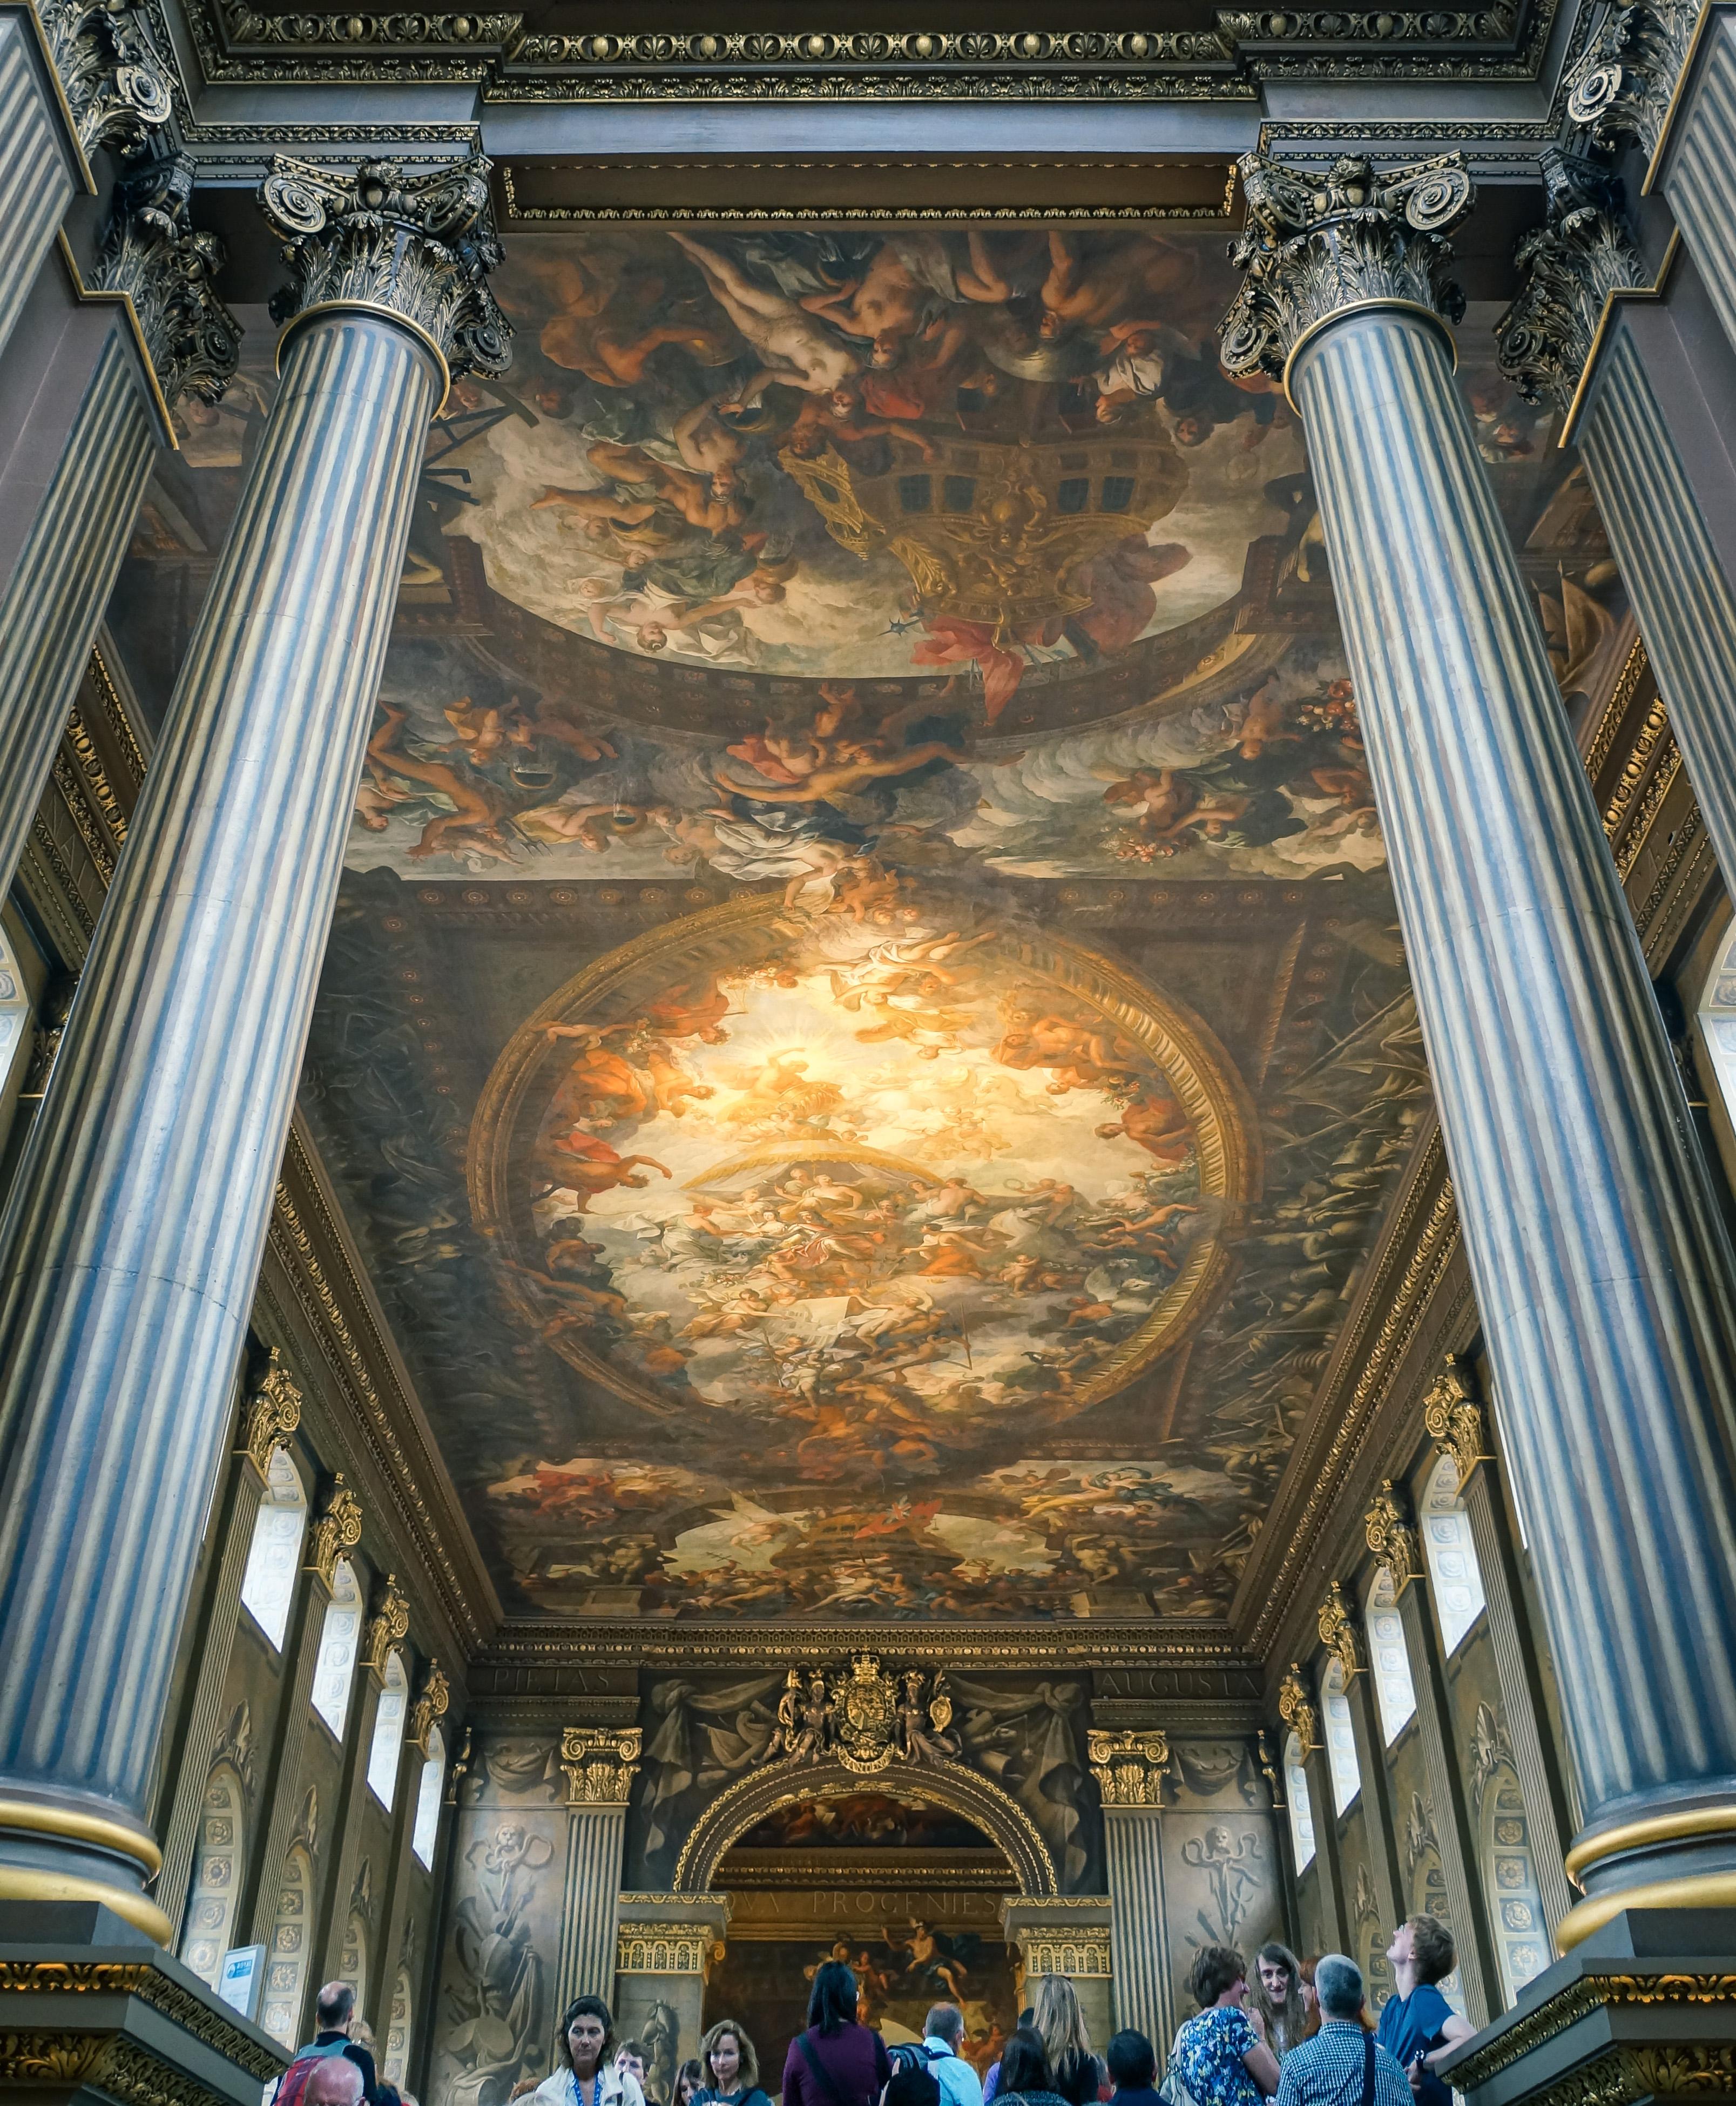 https://upload.wikimedia.org/wikipedia/commons/2/2c/Painted_Hall.jpg